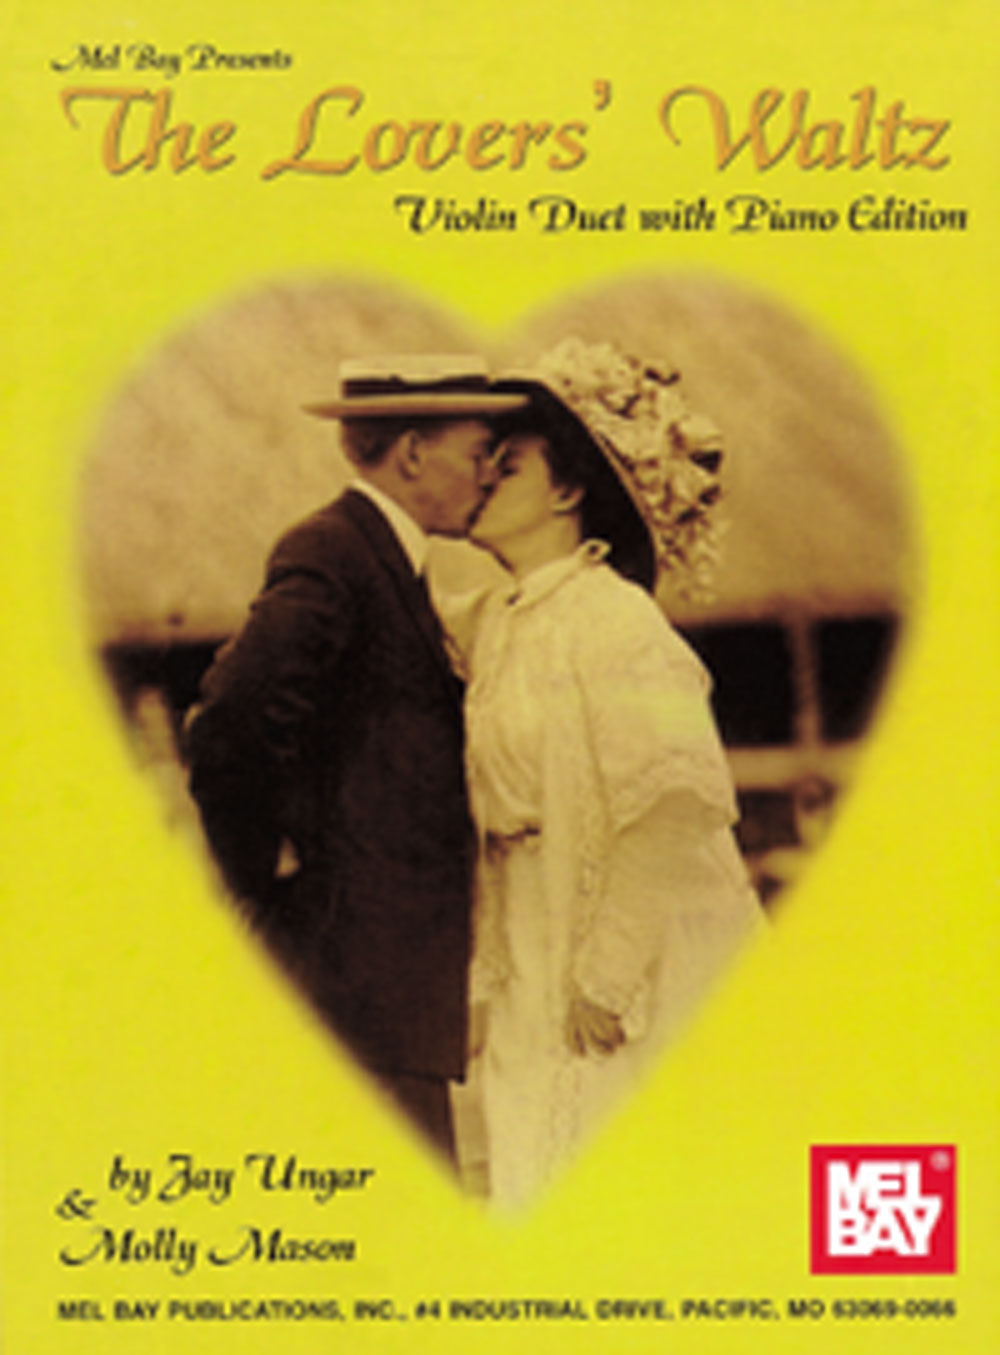 The Lover's Waltz